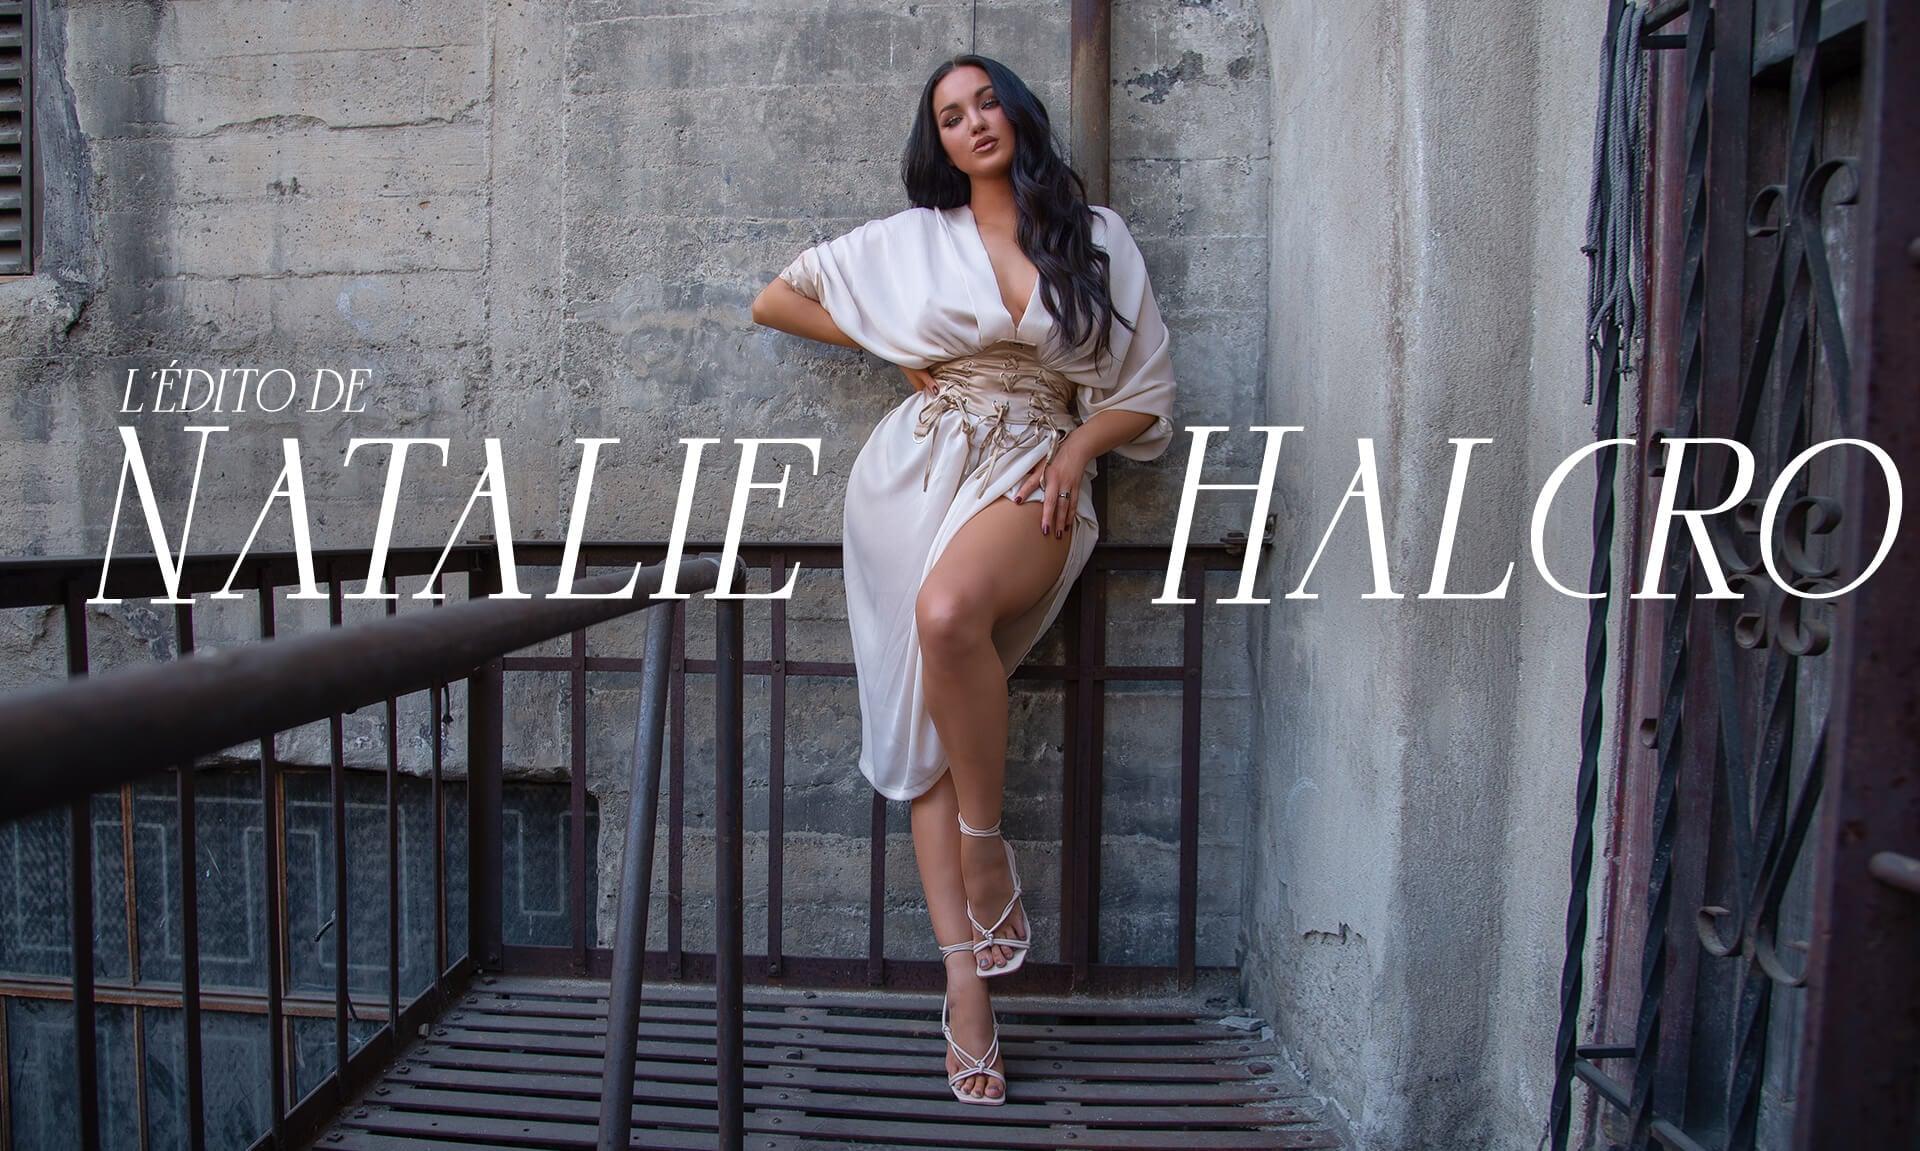 Natalie Halcro Splash